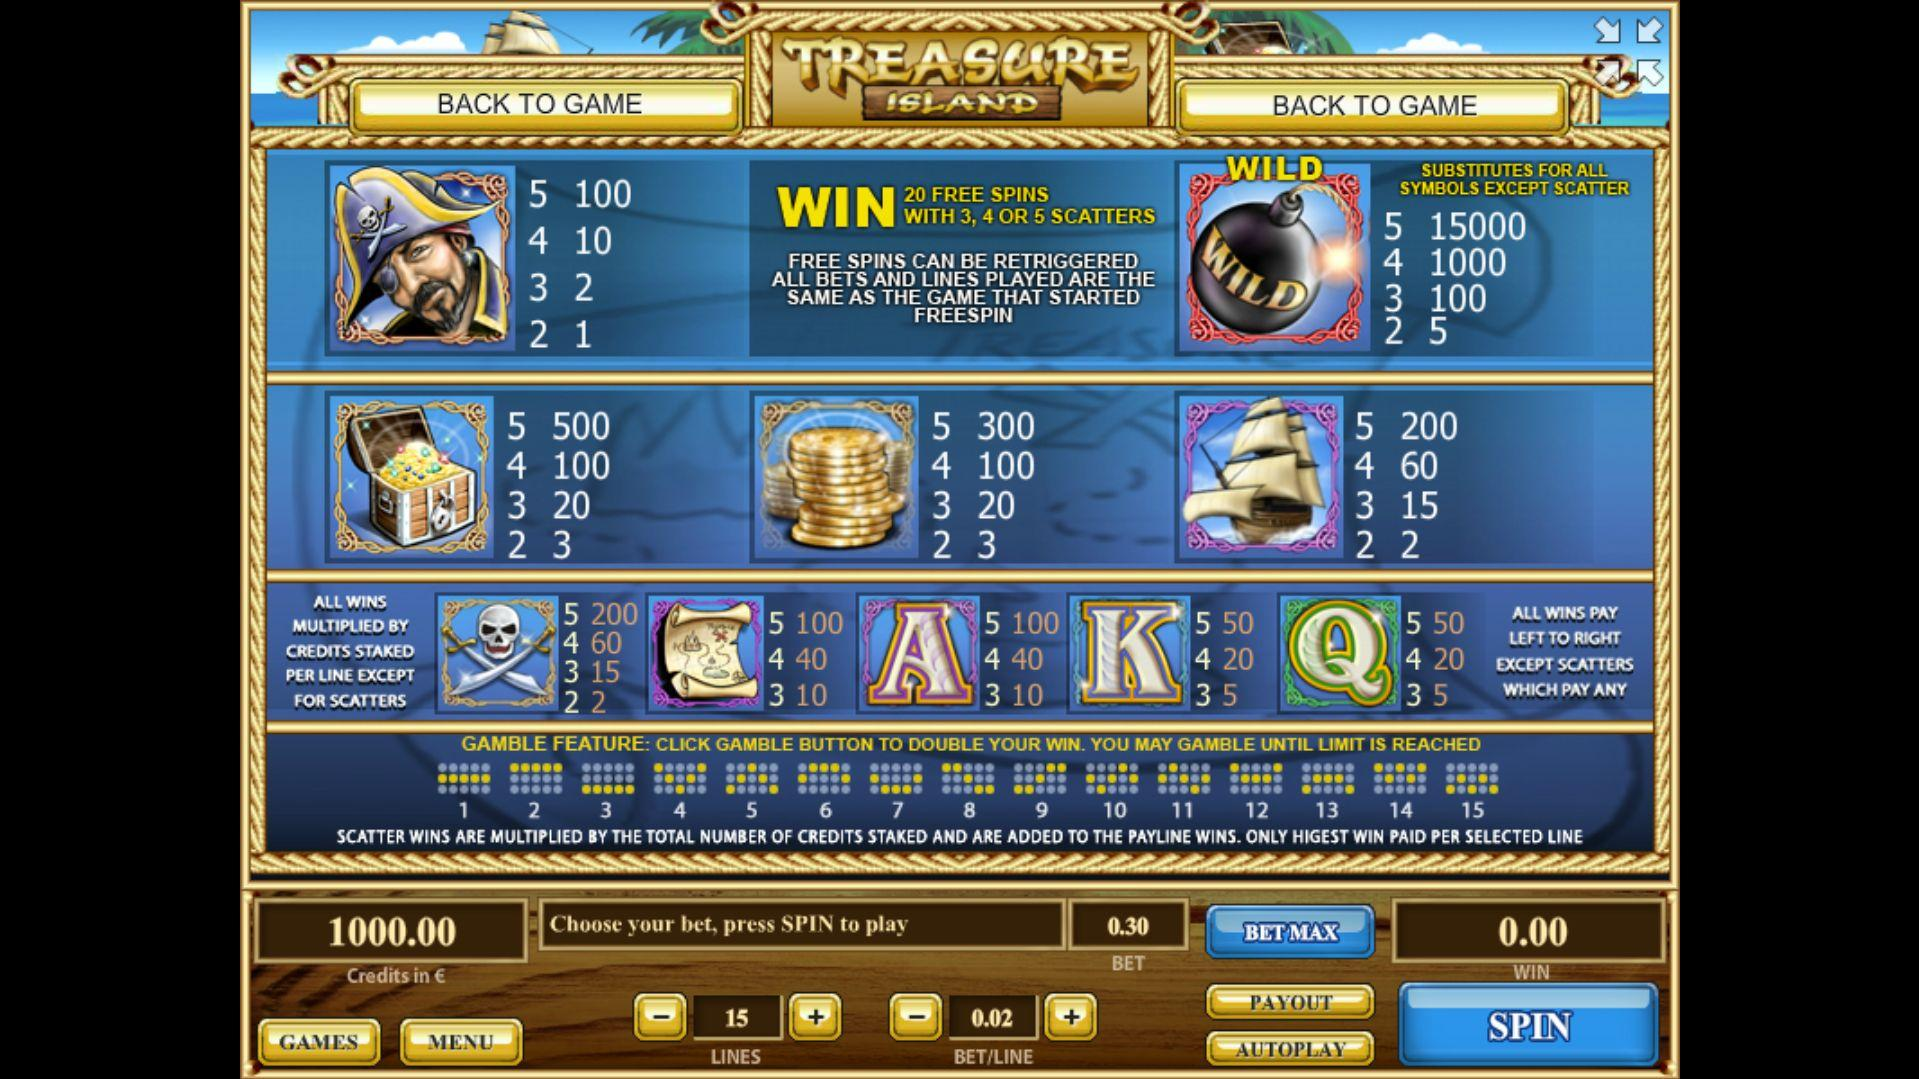 Treasure Island Slot Game Symbols and Winning Combinations